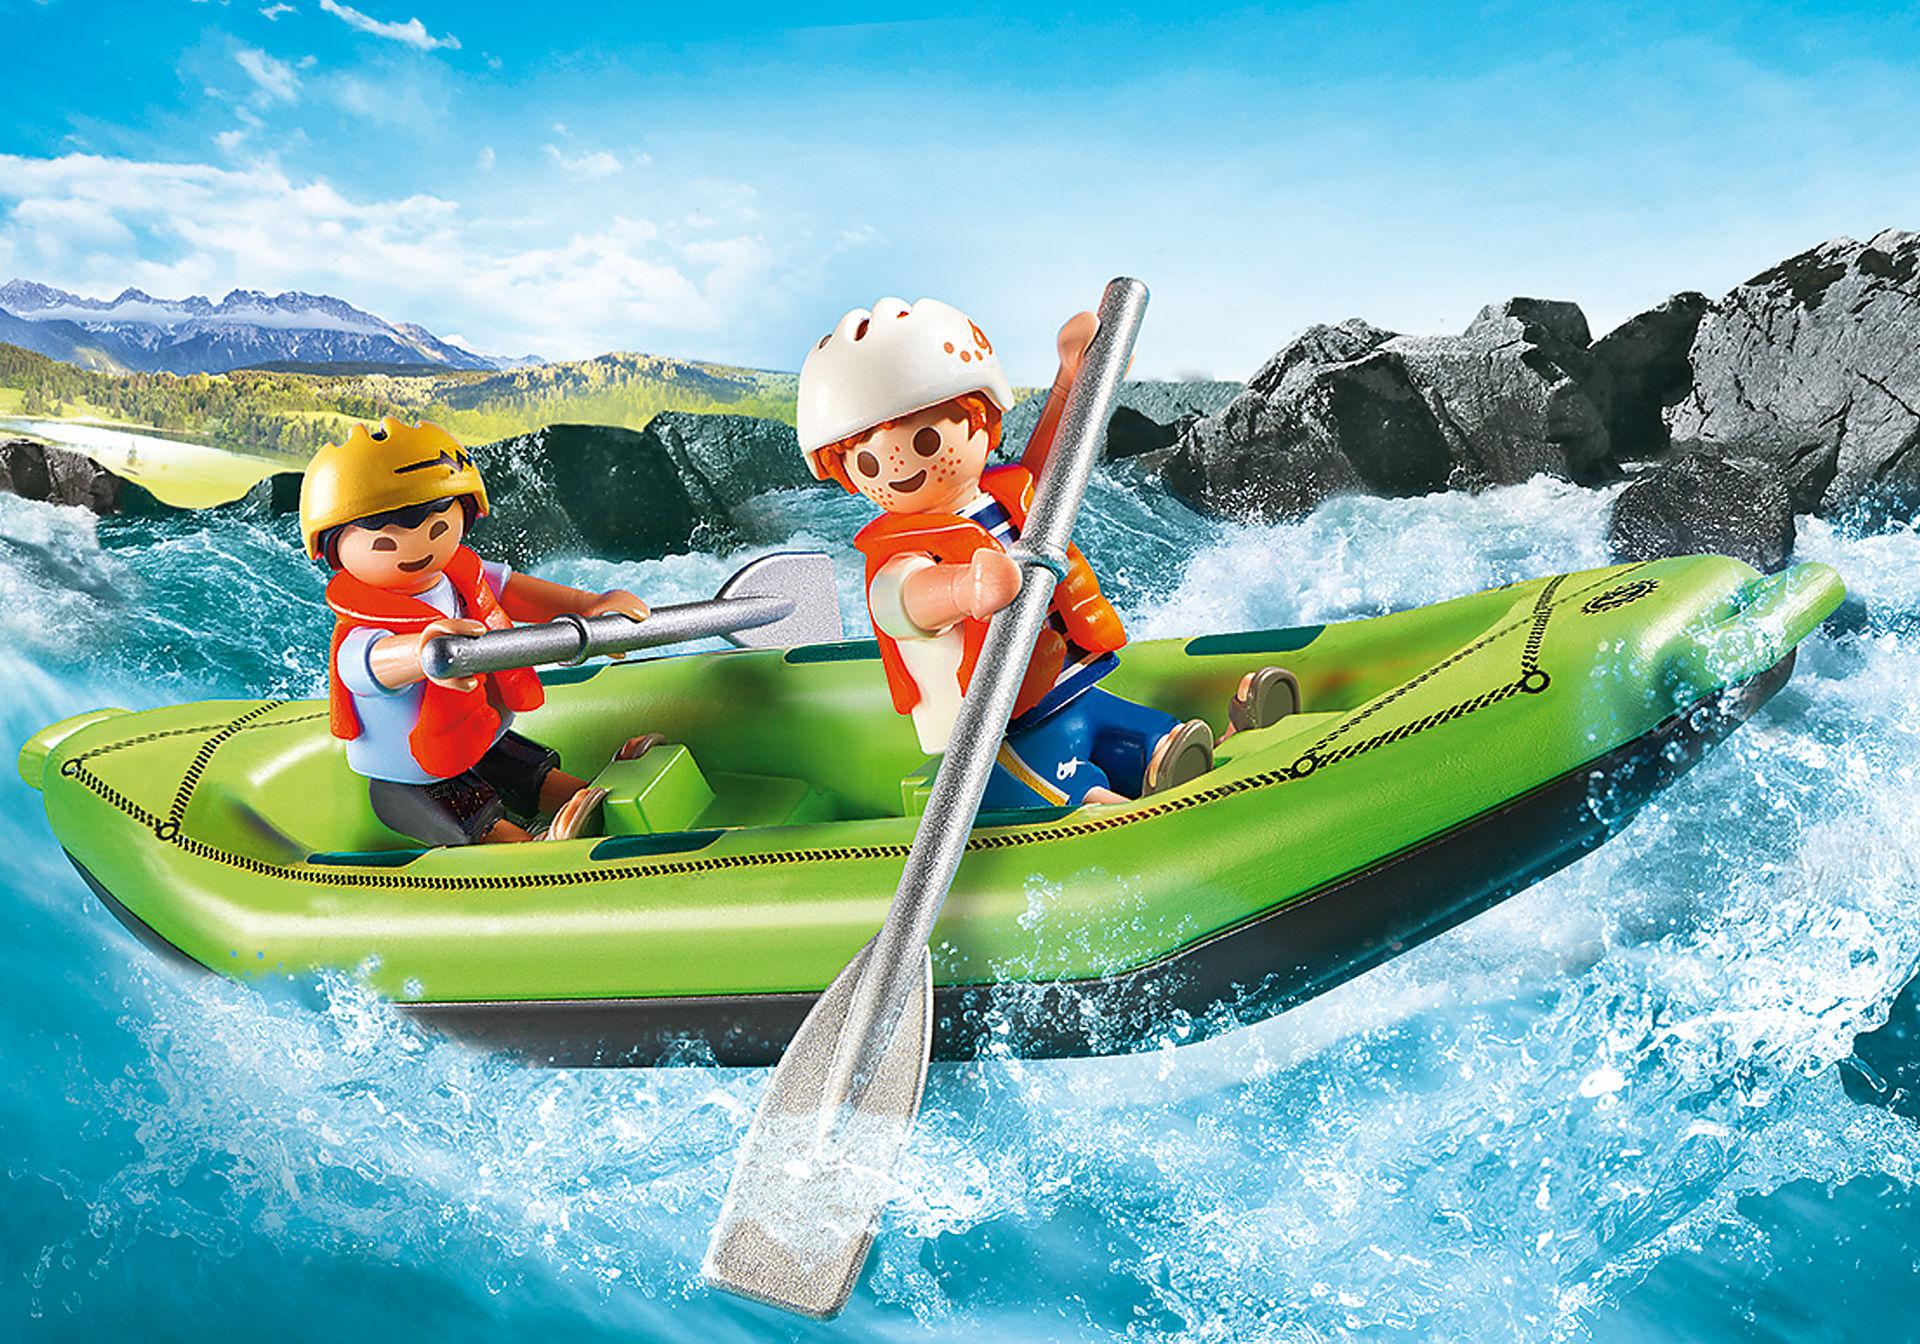 http://media.playmobil.com/i/playmobil/6892_product_detail/Enfants avec radeau pneumatique